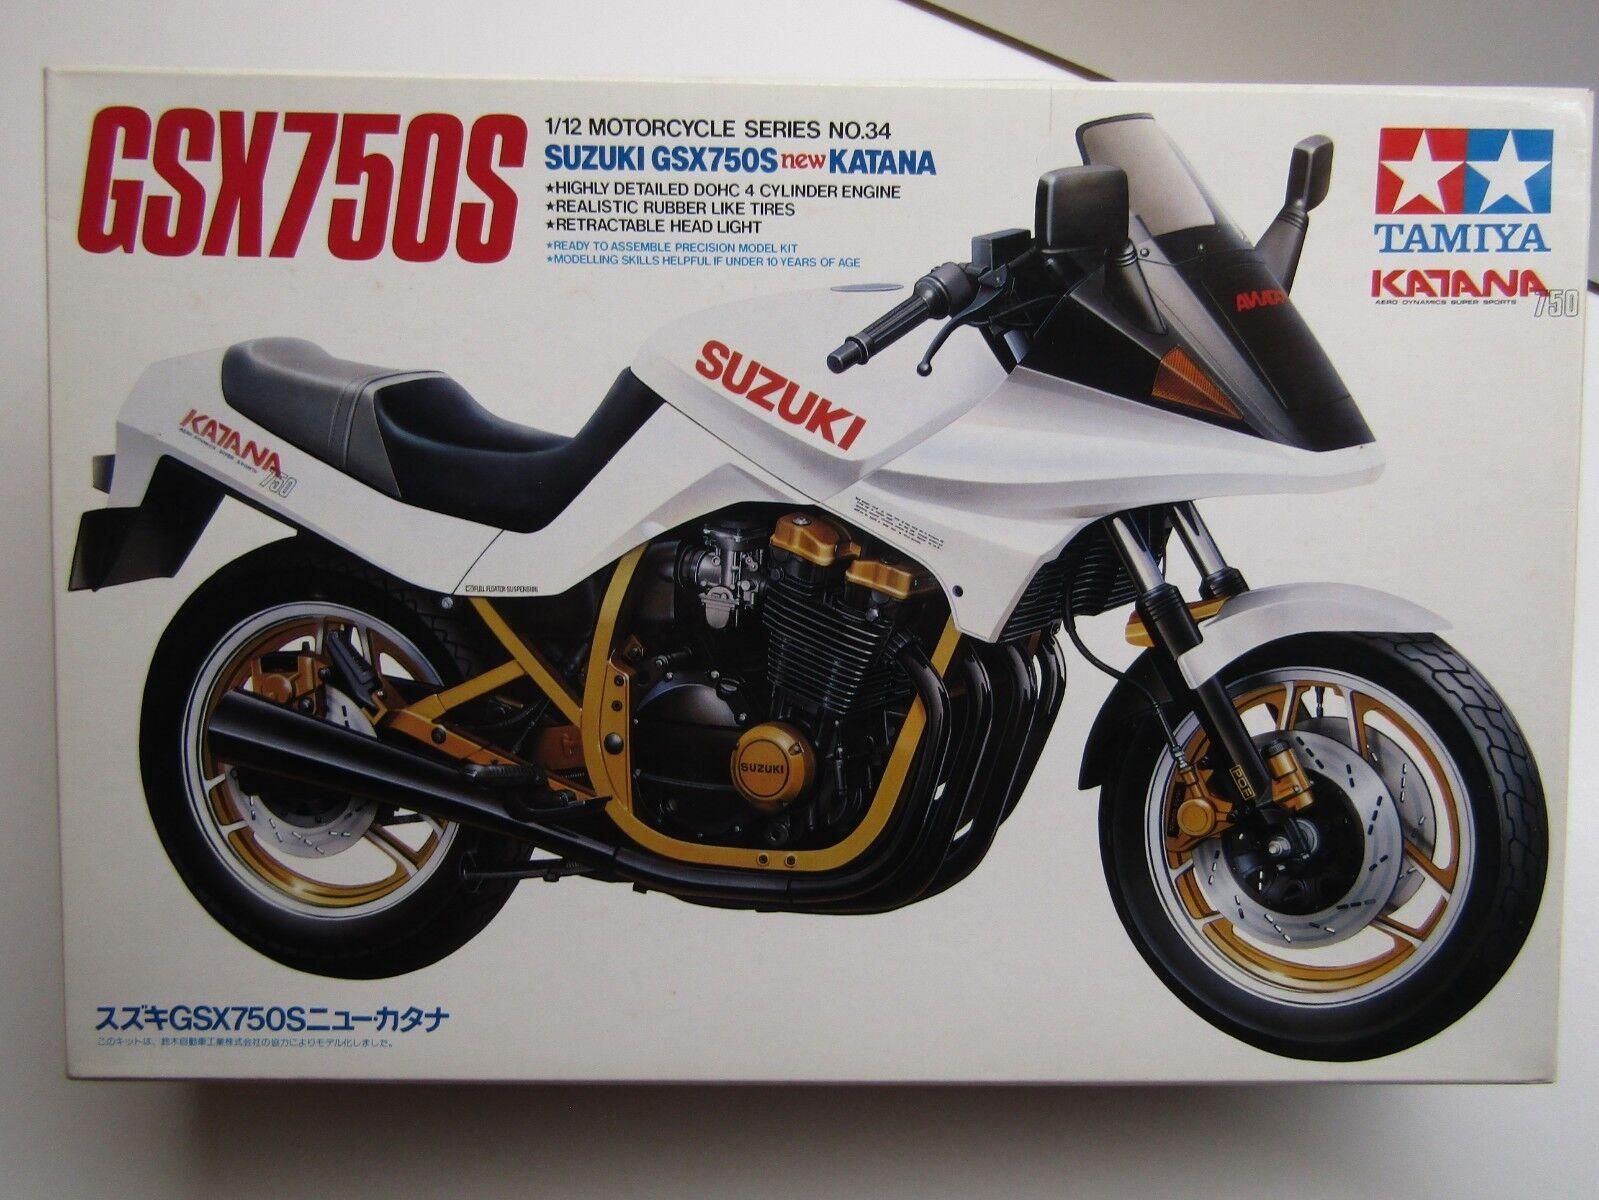 Tamiya 1 12 Scale Suzuki GSX750S New Katana Model Kit - New - Kit 900